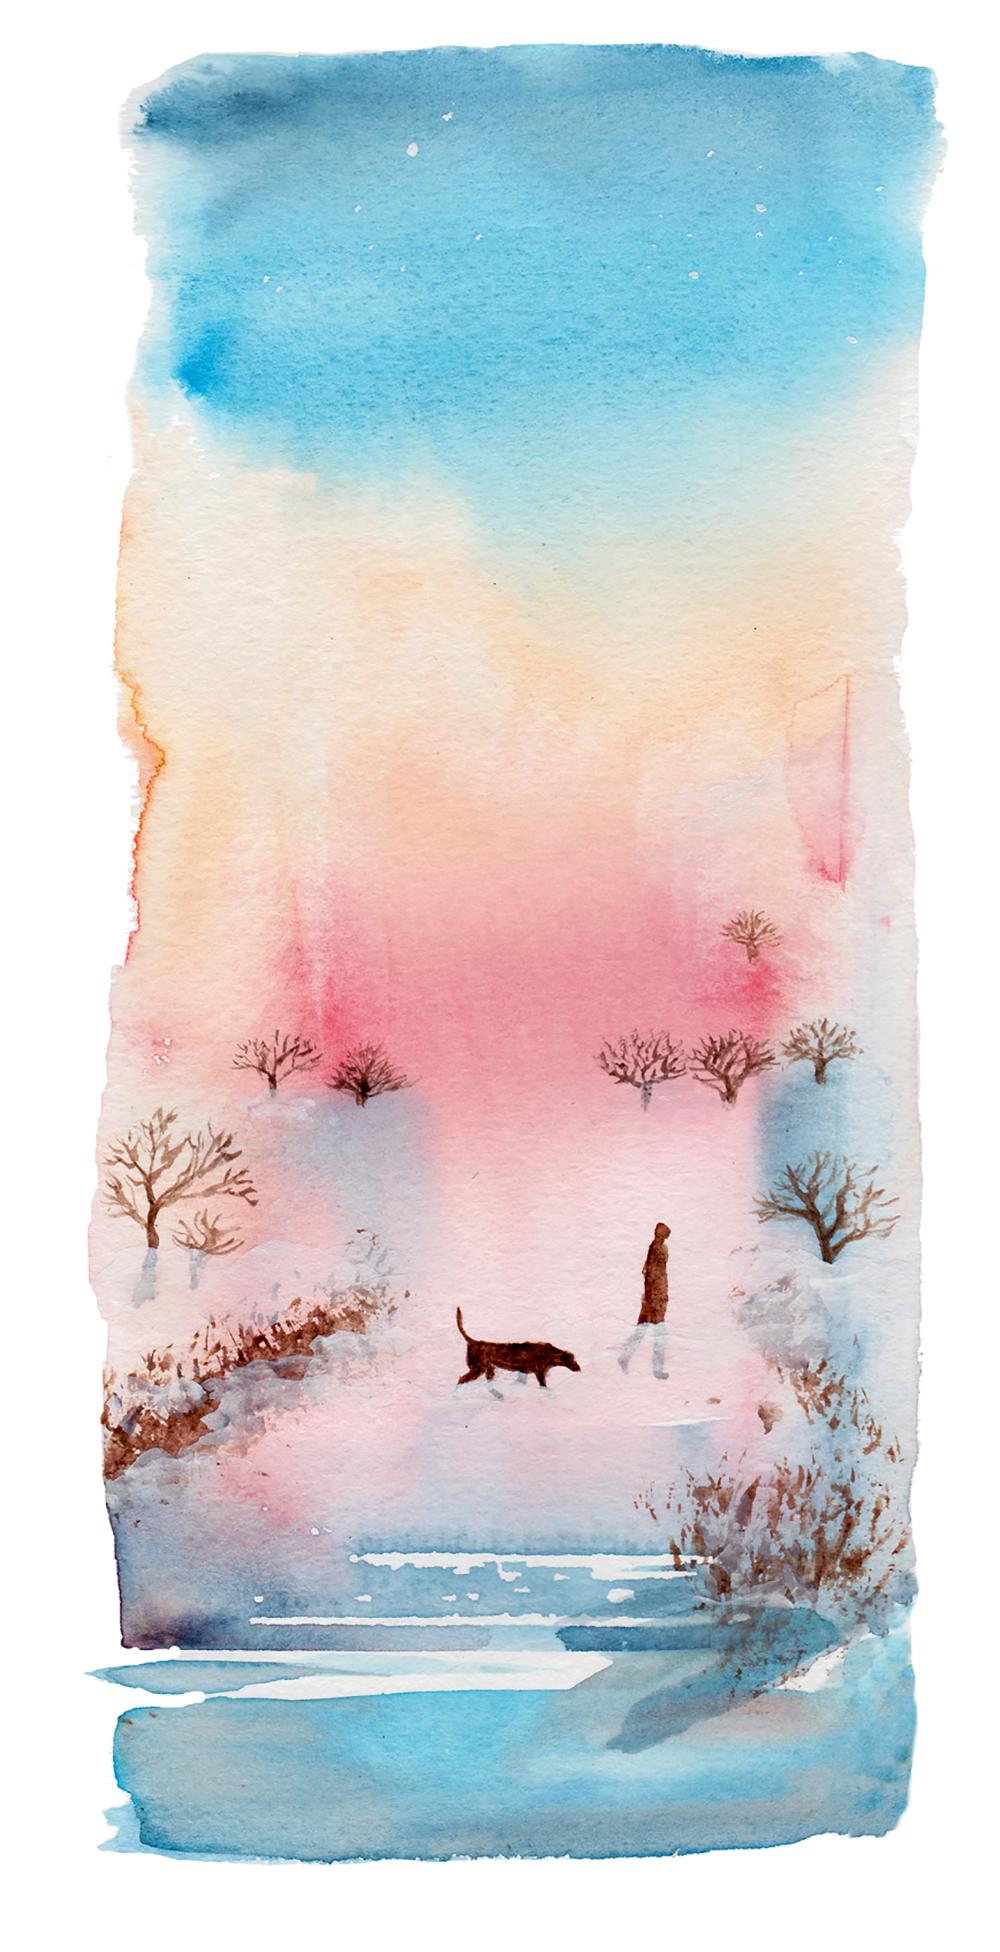 A Dog in the Fog by Emma Burleigh